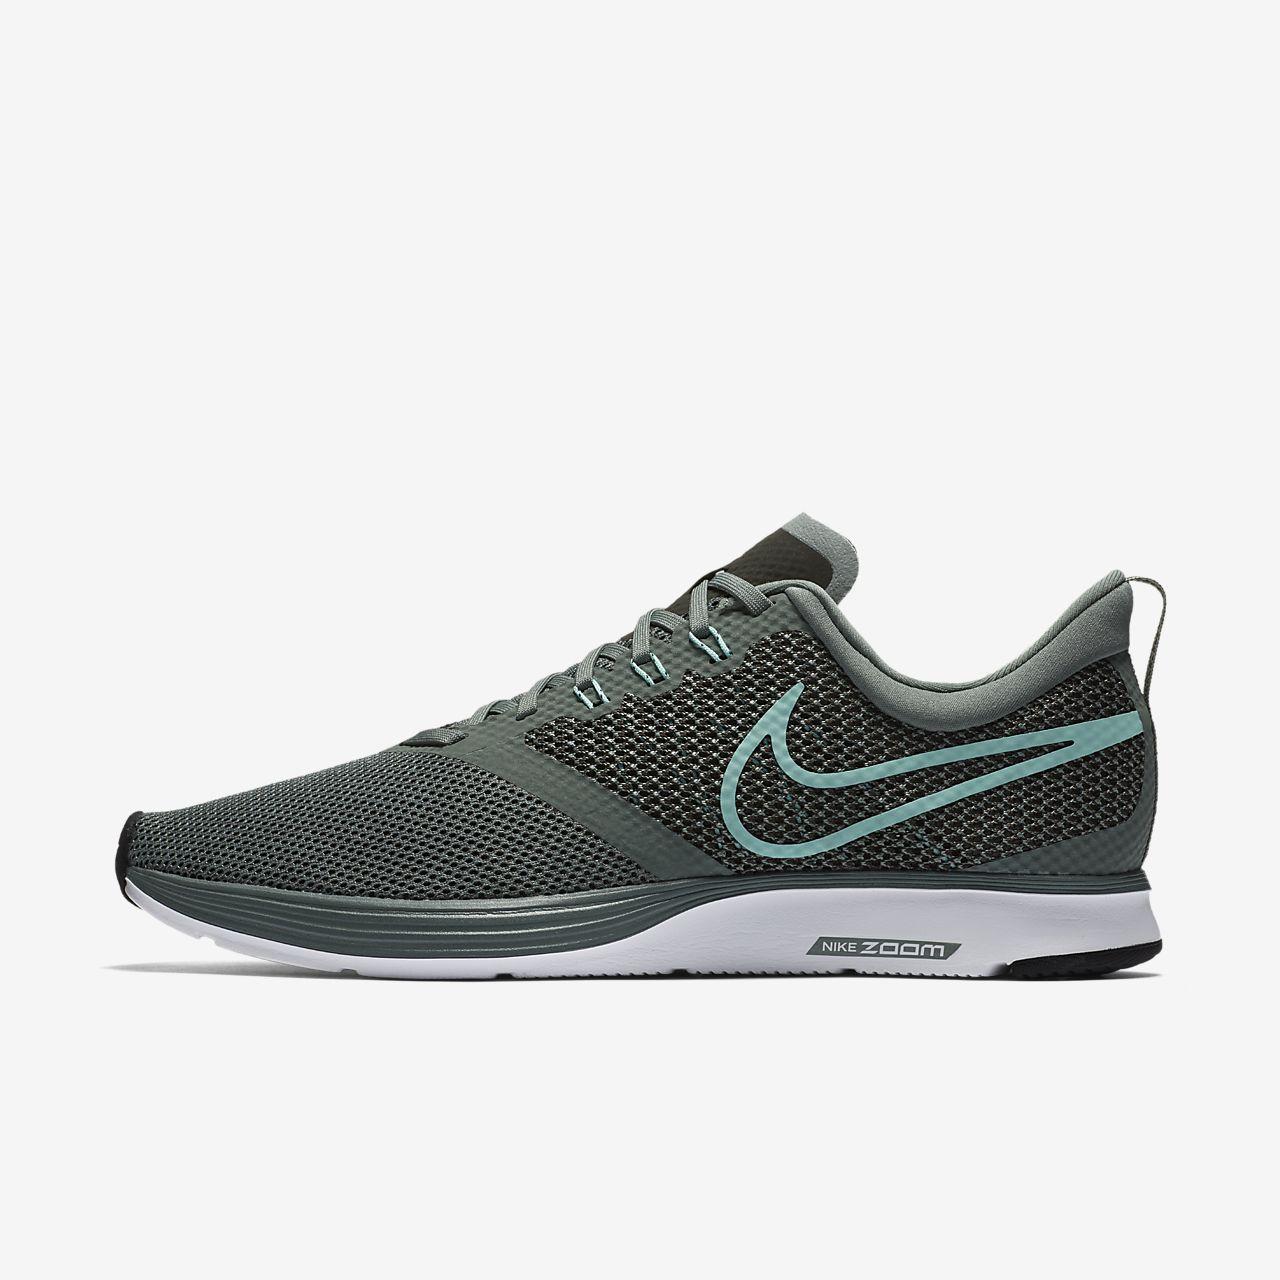 Nike Zoom Strike Men's Running DK